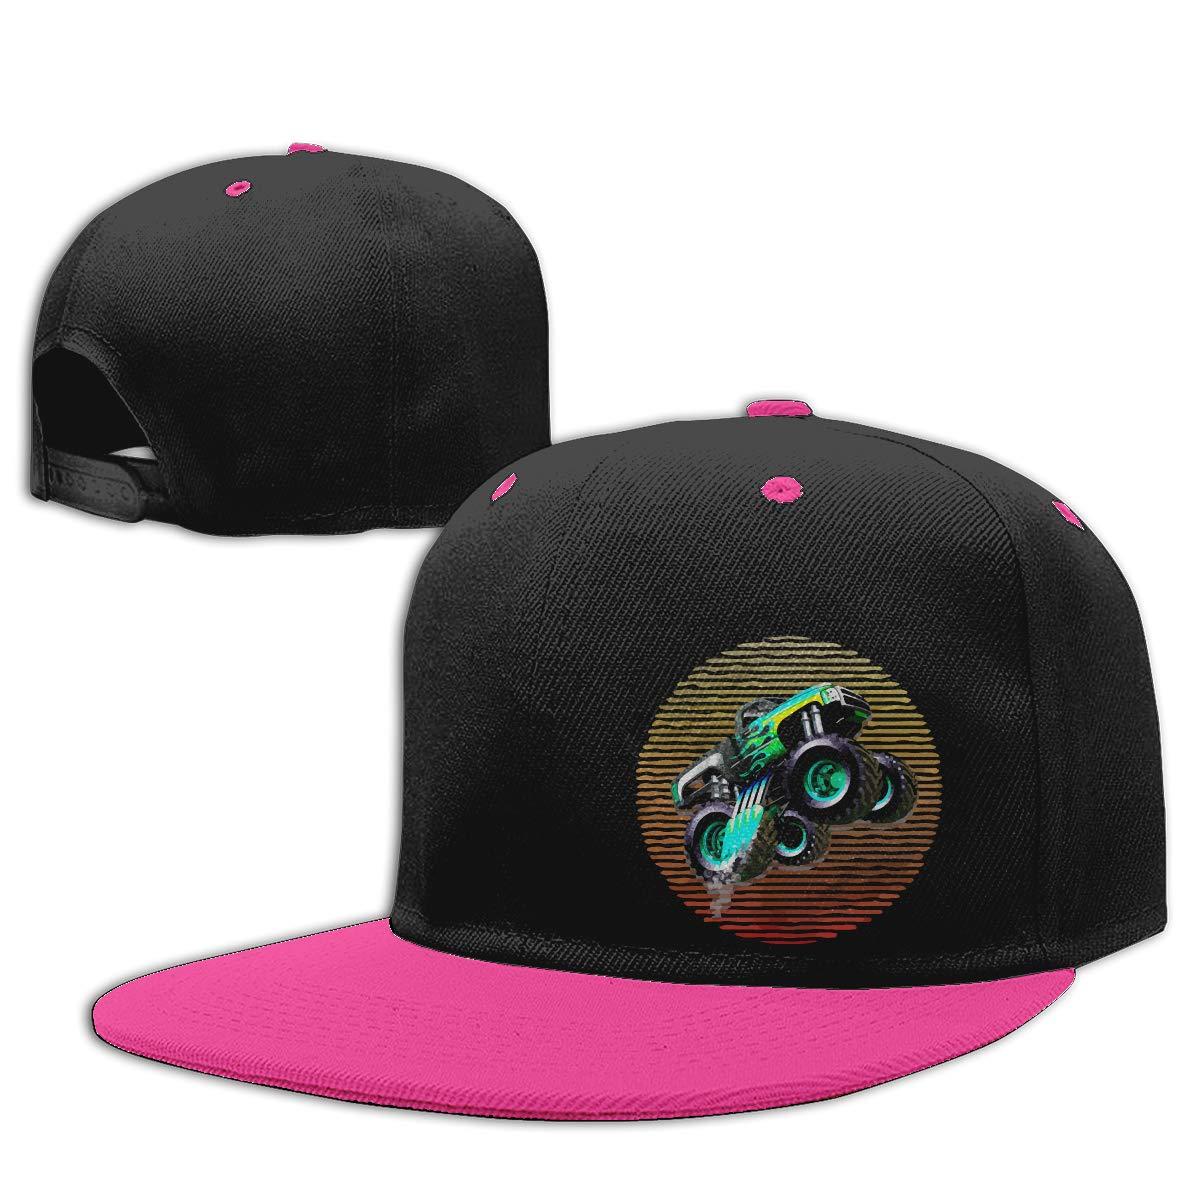 NMG-01 Men Womens Plain Cap Truck Rally Racing Dirt Adjustable Hip-Hop Baseball Caps